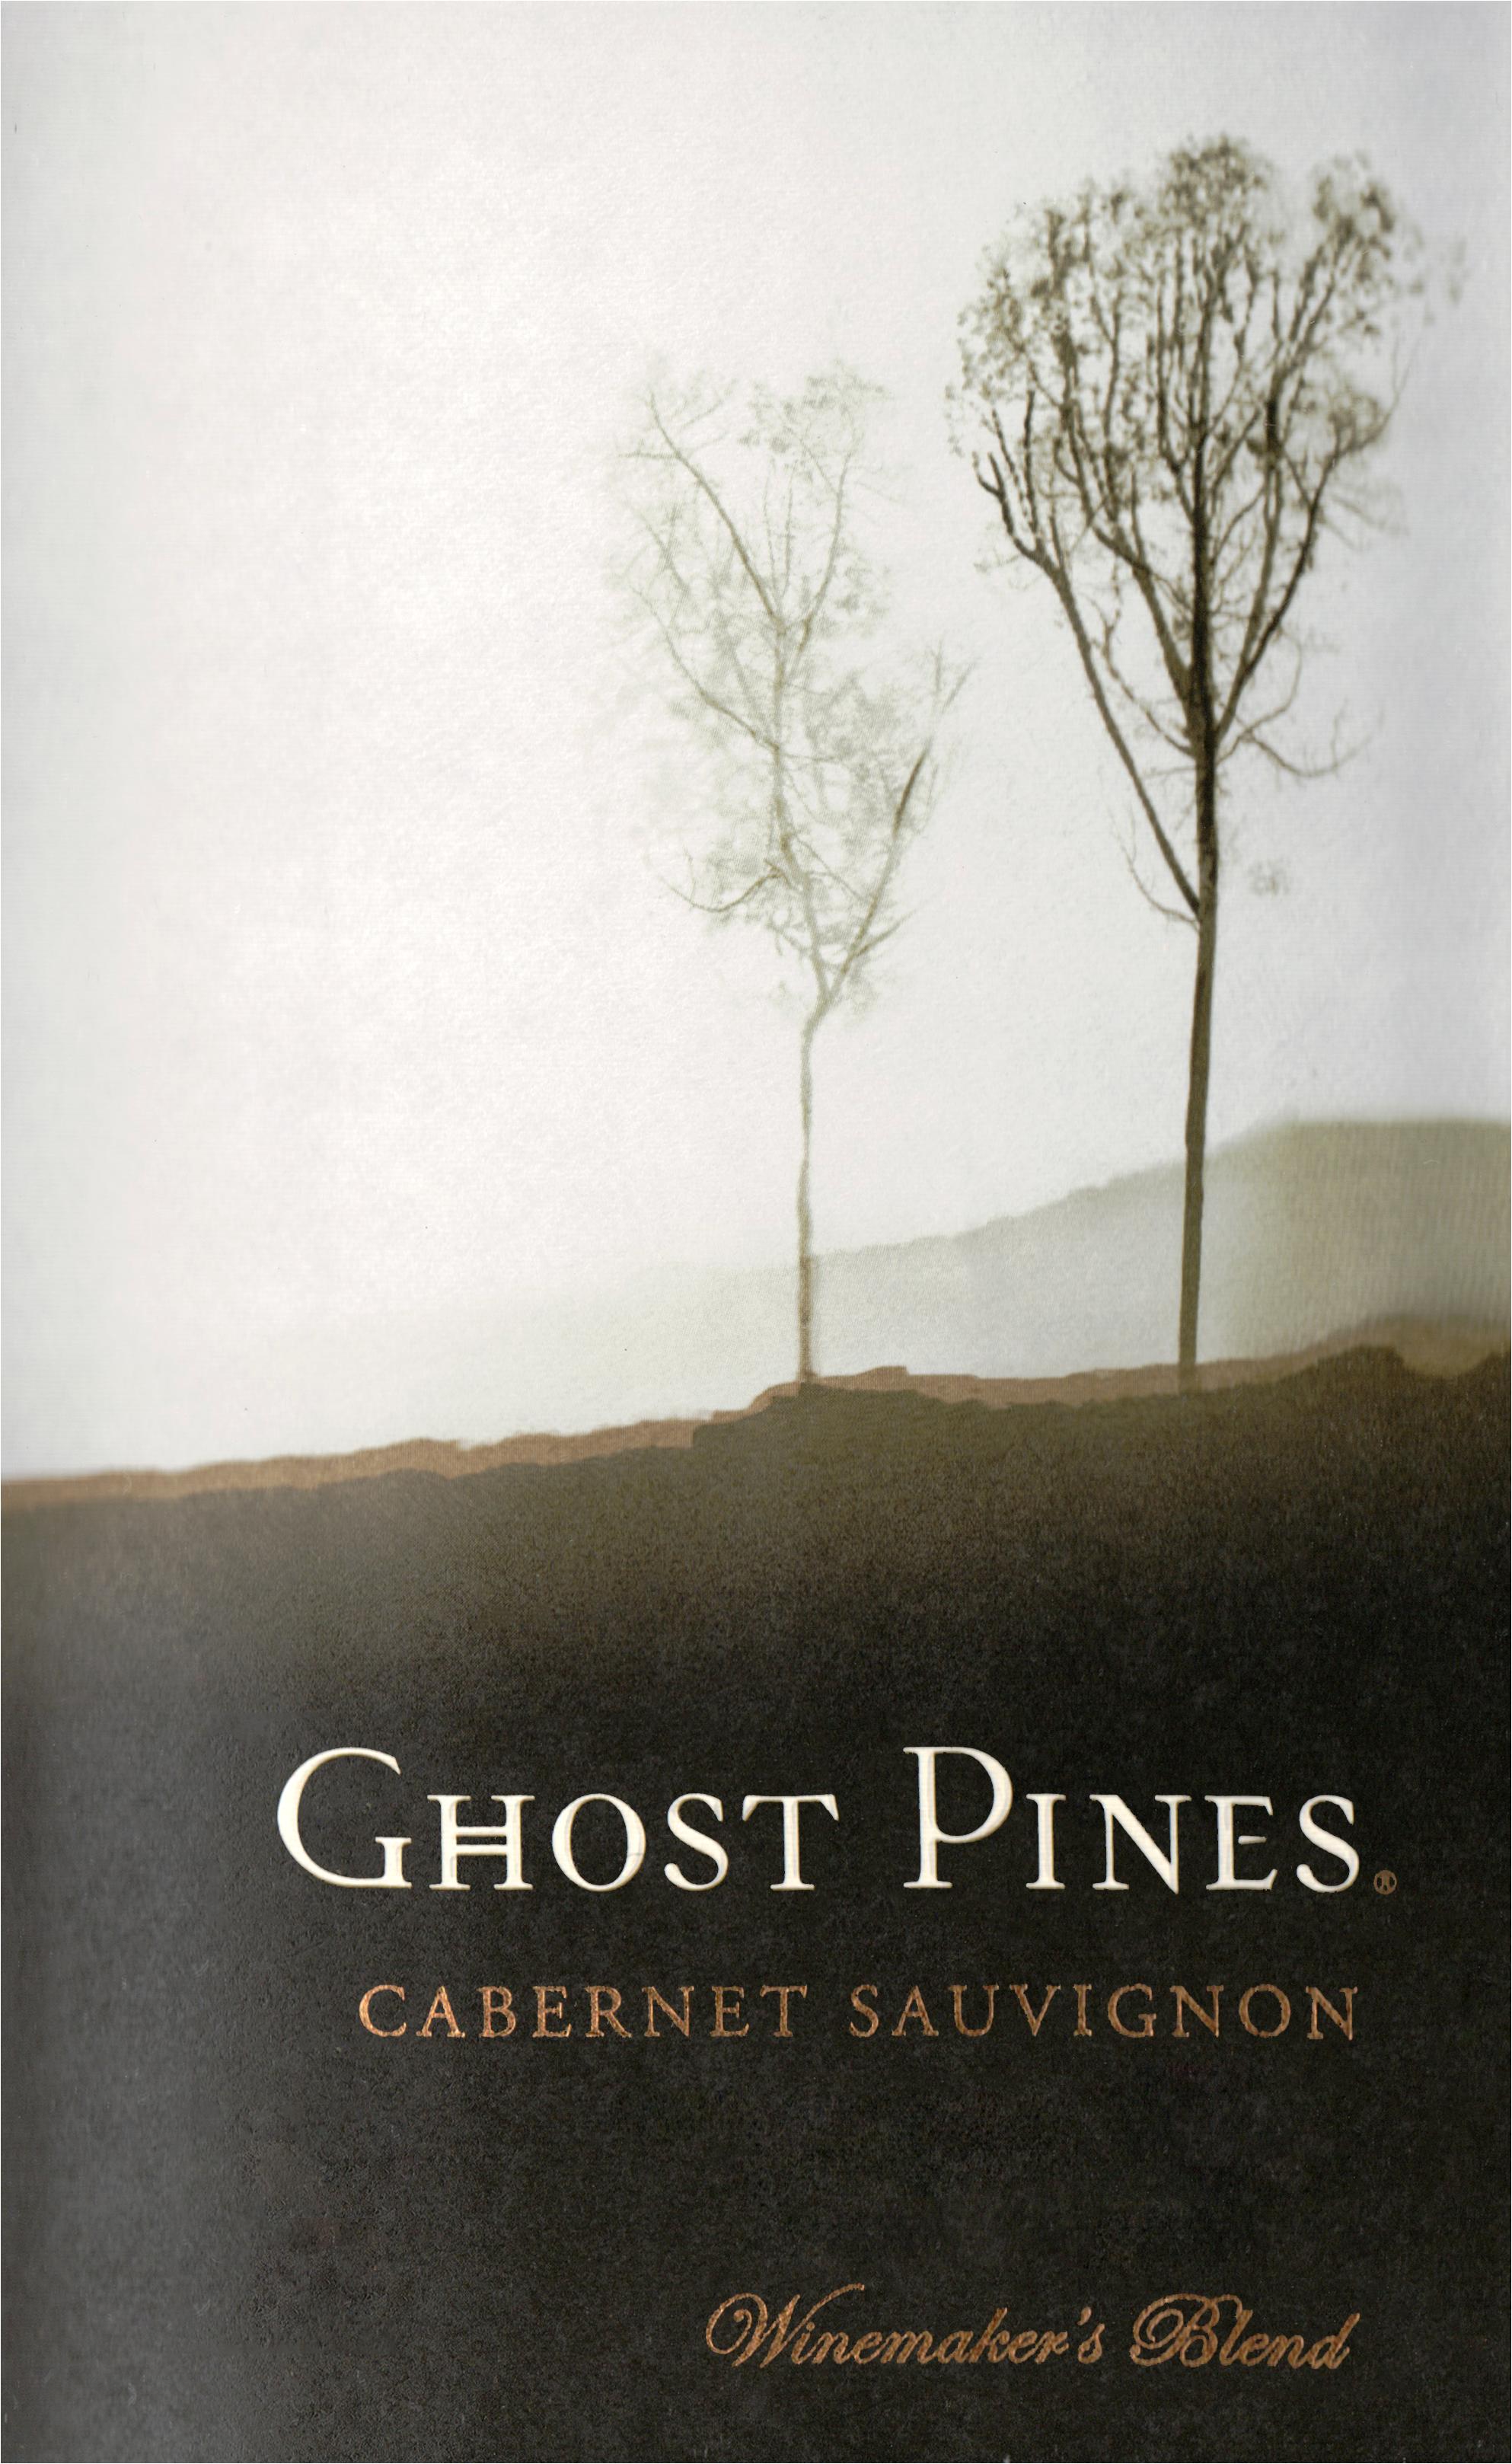 Ghost Pines Cabernet Sauvignon 2017